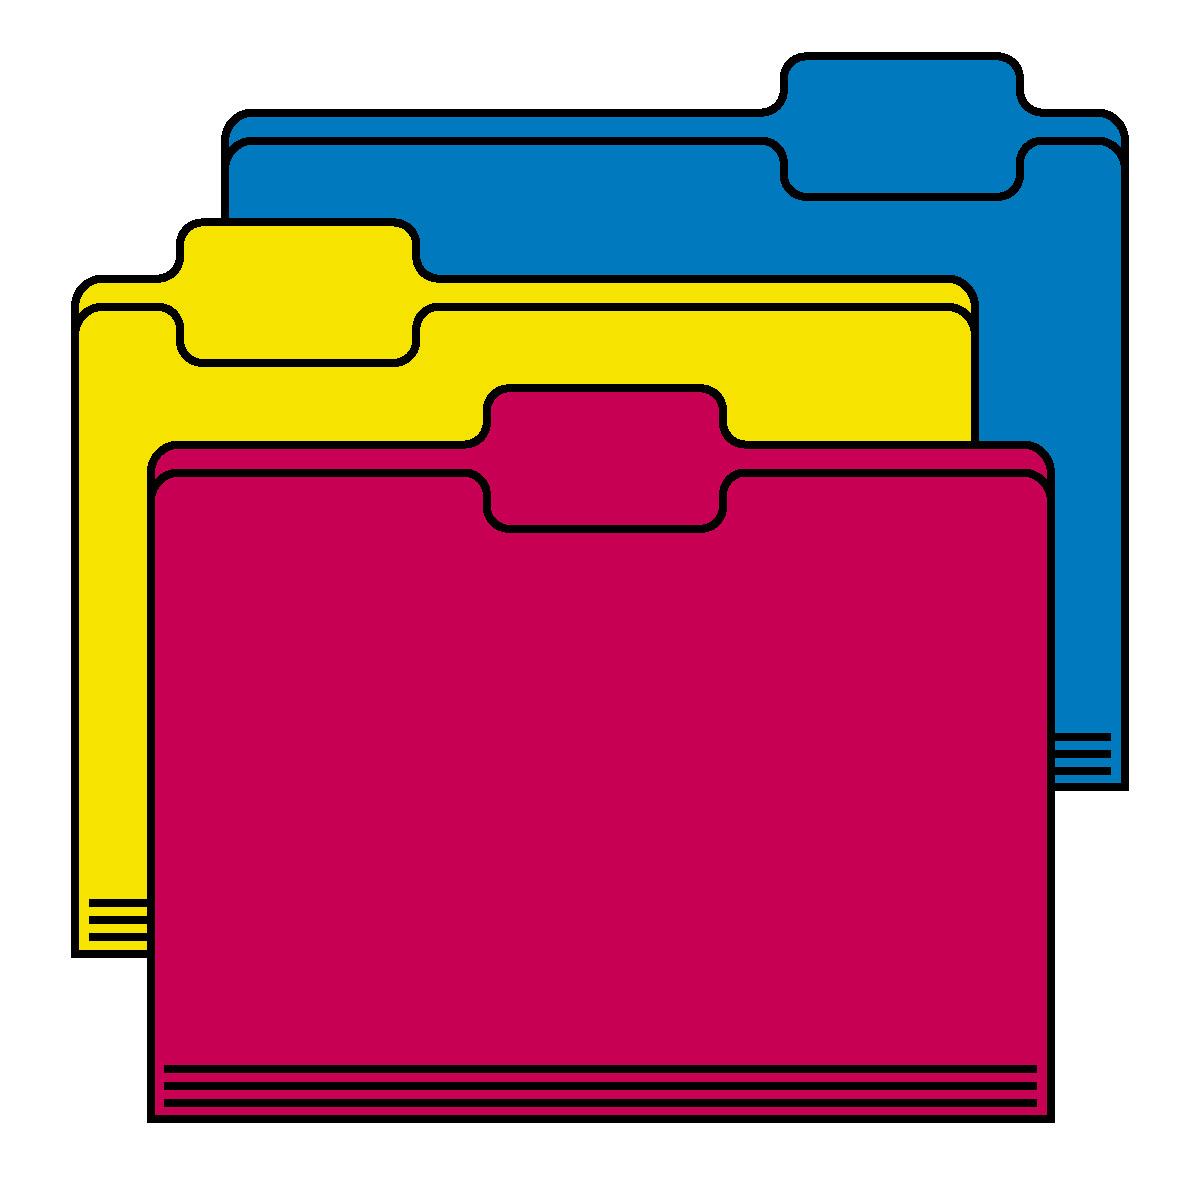 Folder clipart.  folders